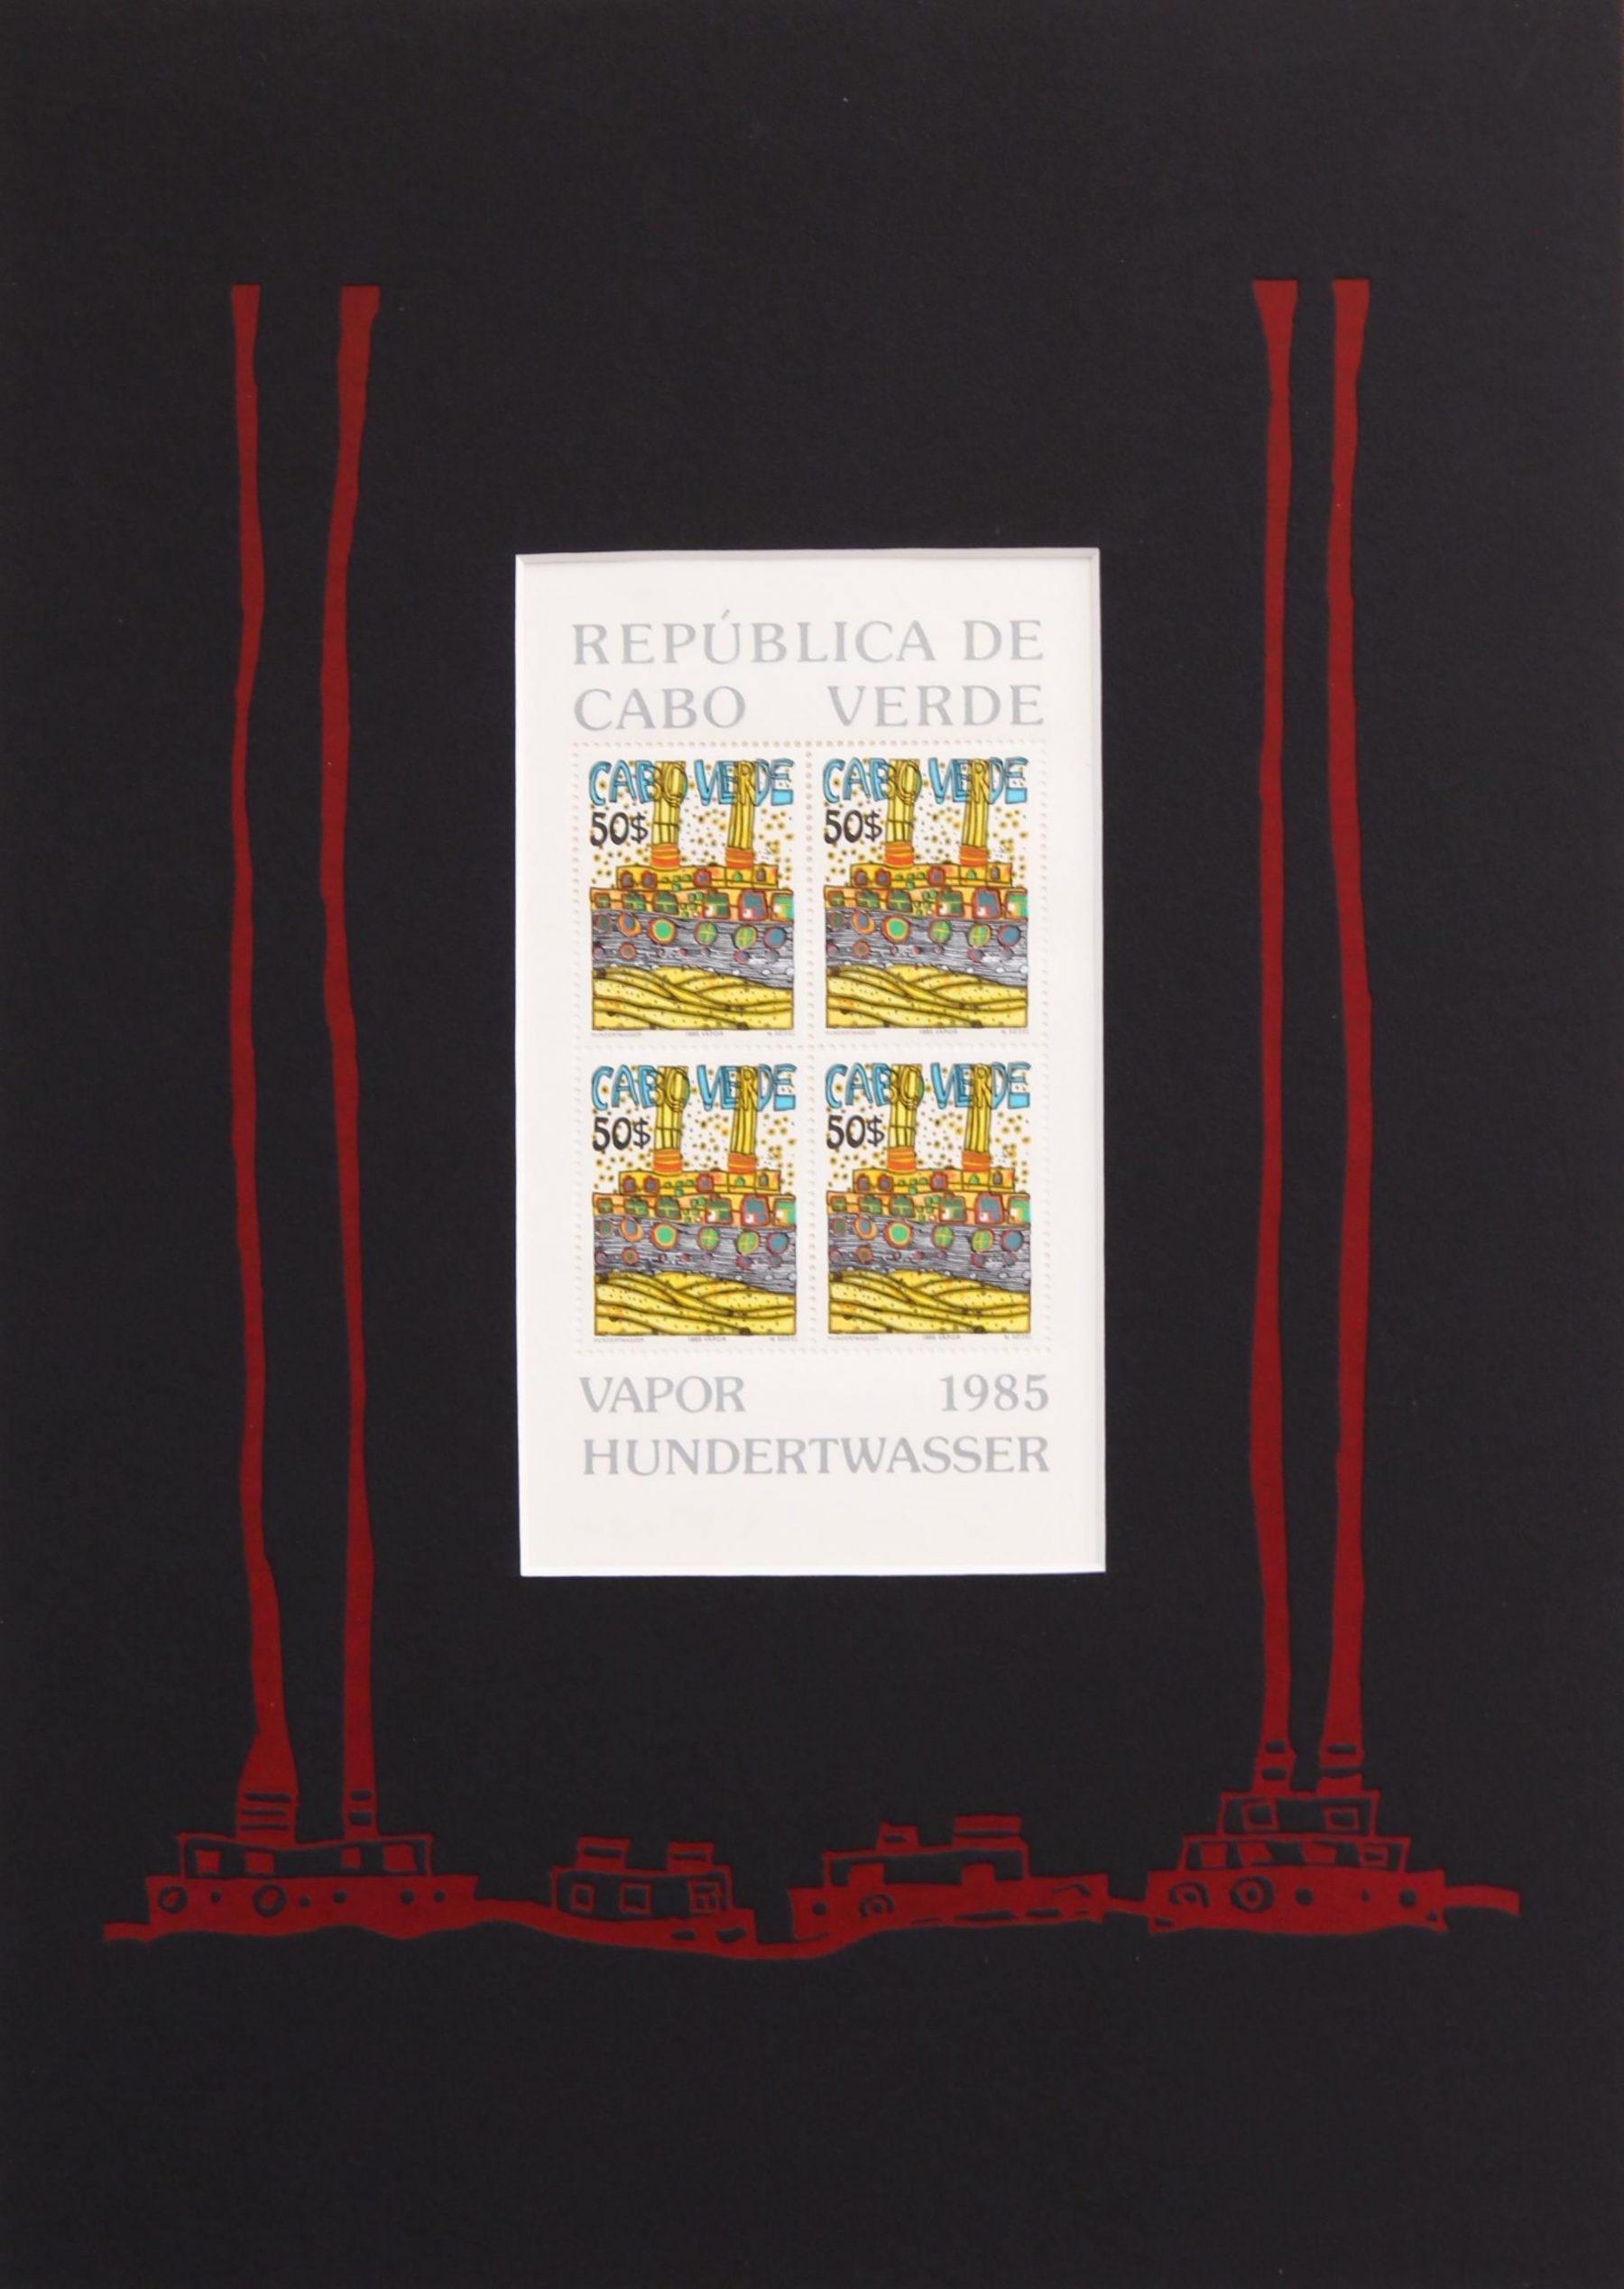 Vapor Briefmarke, PP rot - Hundertwasser, Friedensreich - k-07690